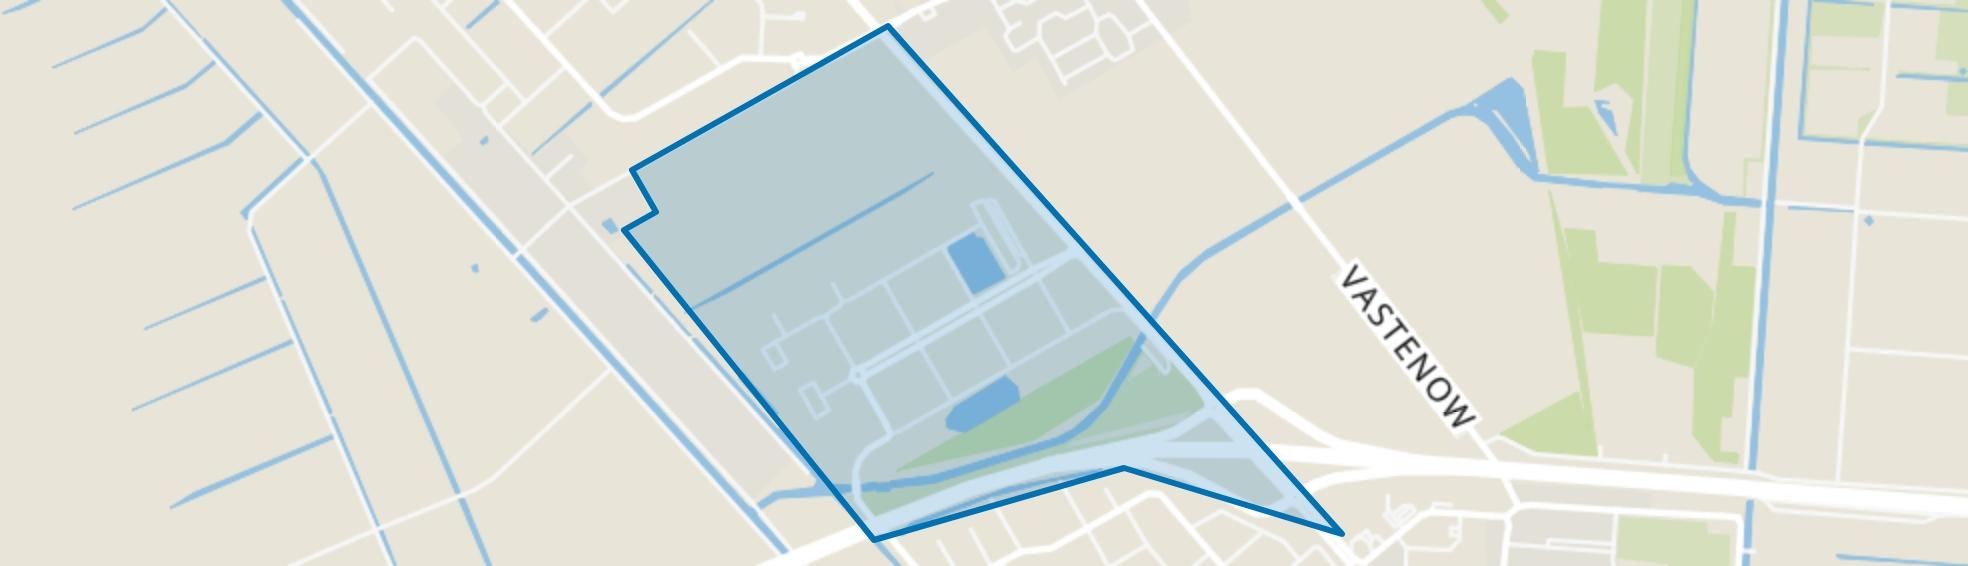 Bedrijvenpark A37, Emmen map